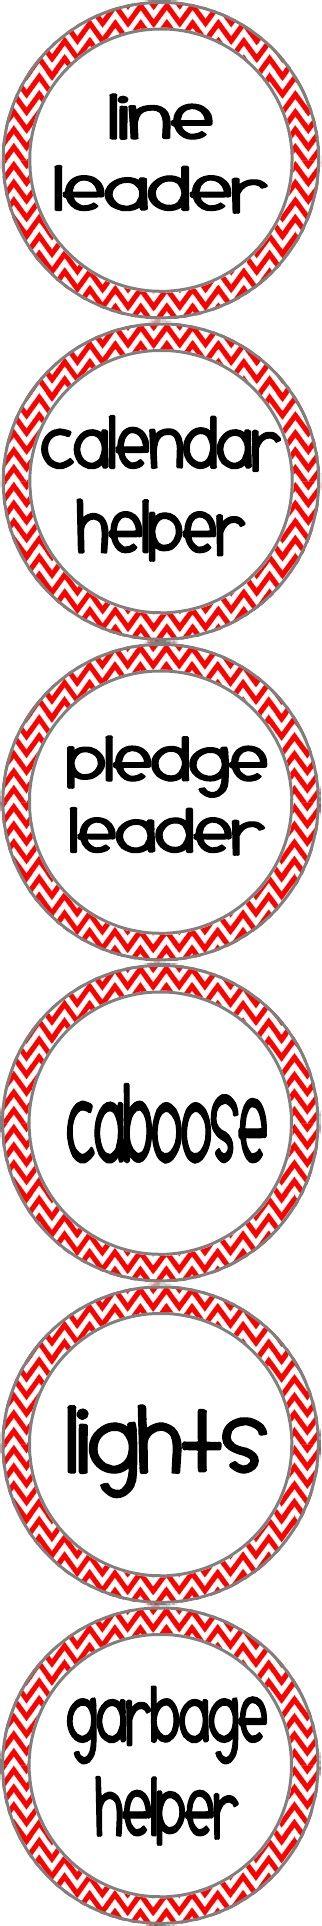 Classroom Helper Chart Labels :). Pinnin g this so I remember to add light helper next year.